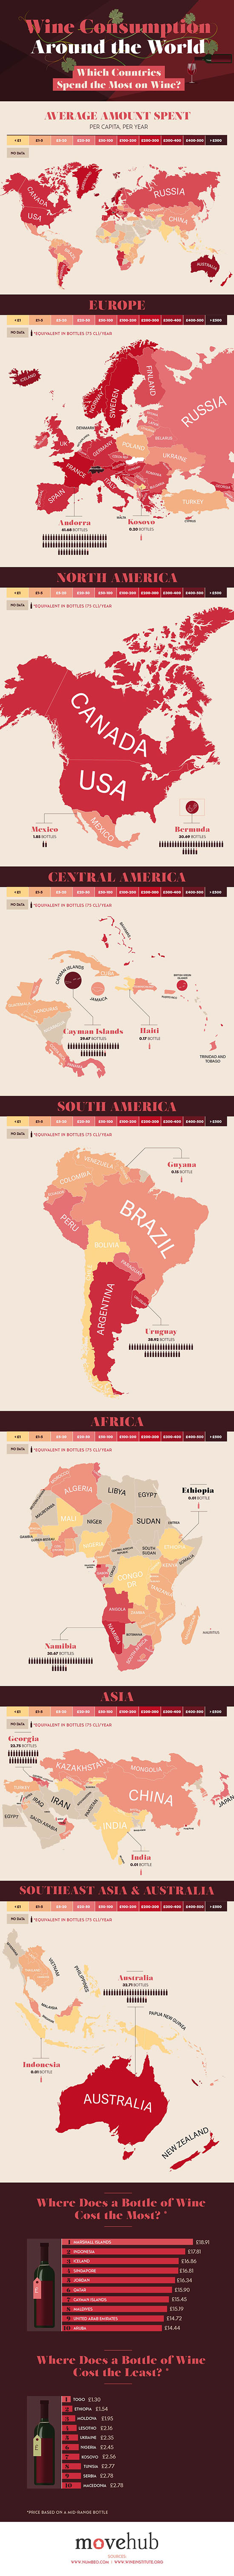 Around The World With Wine - Infographic